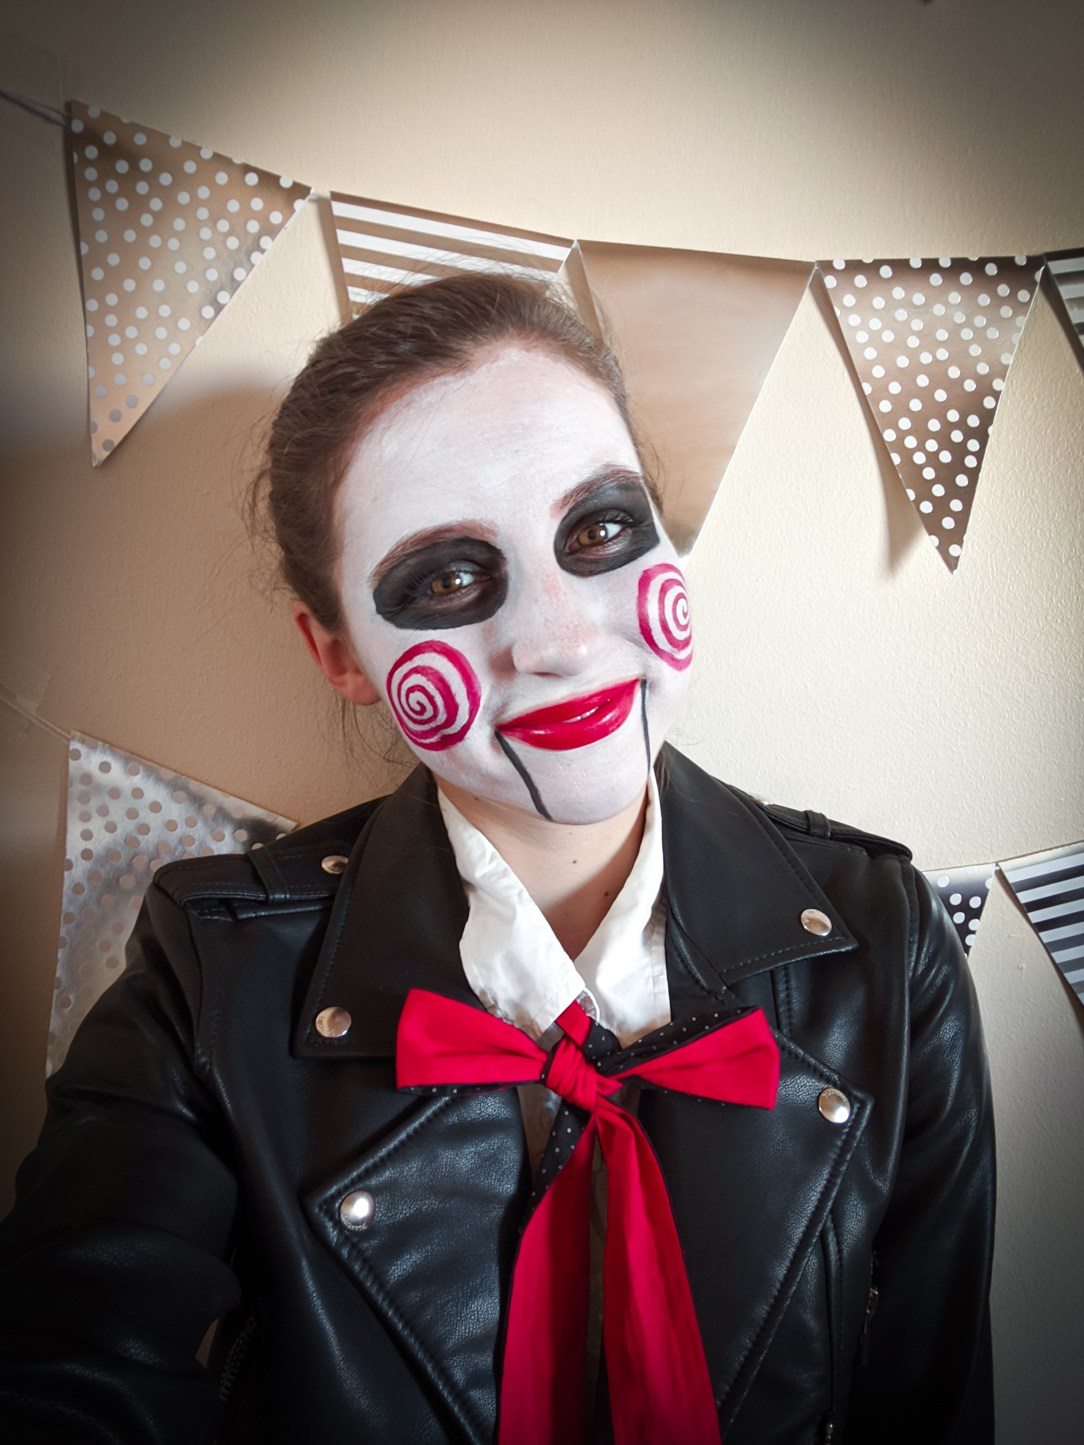 puppet, black pleather jacket, red lipstick